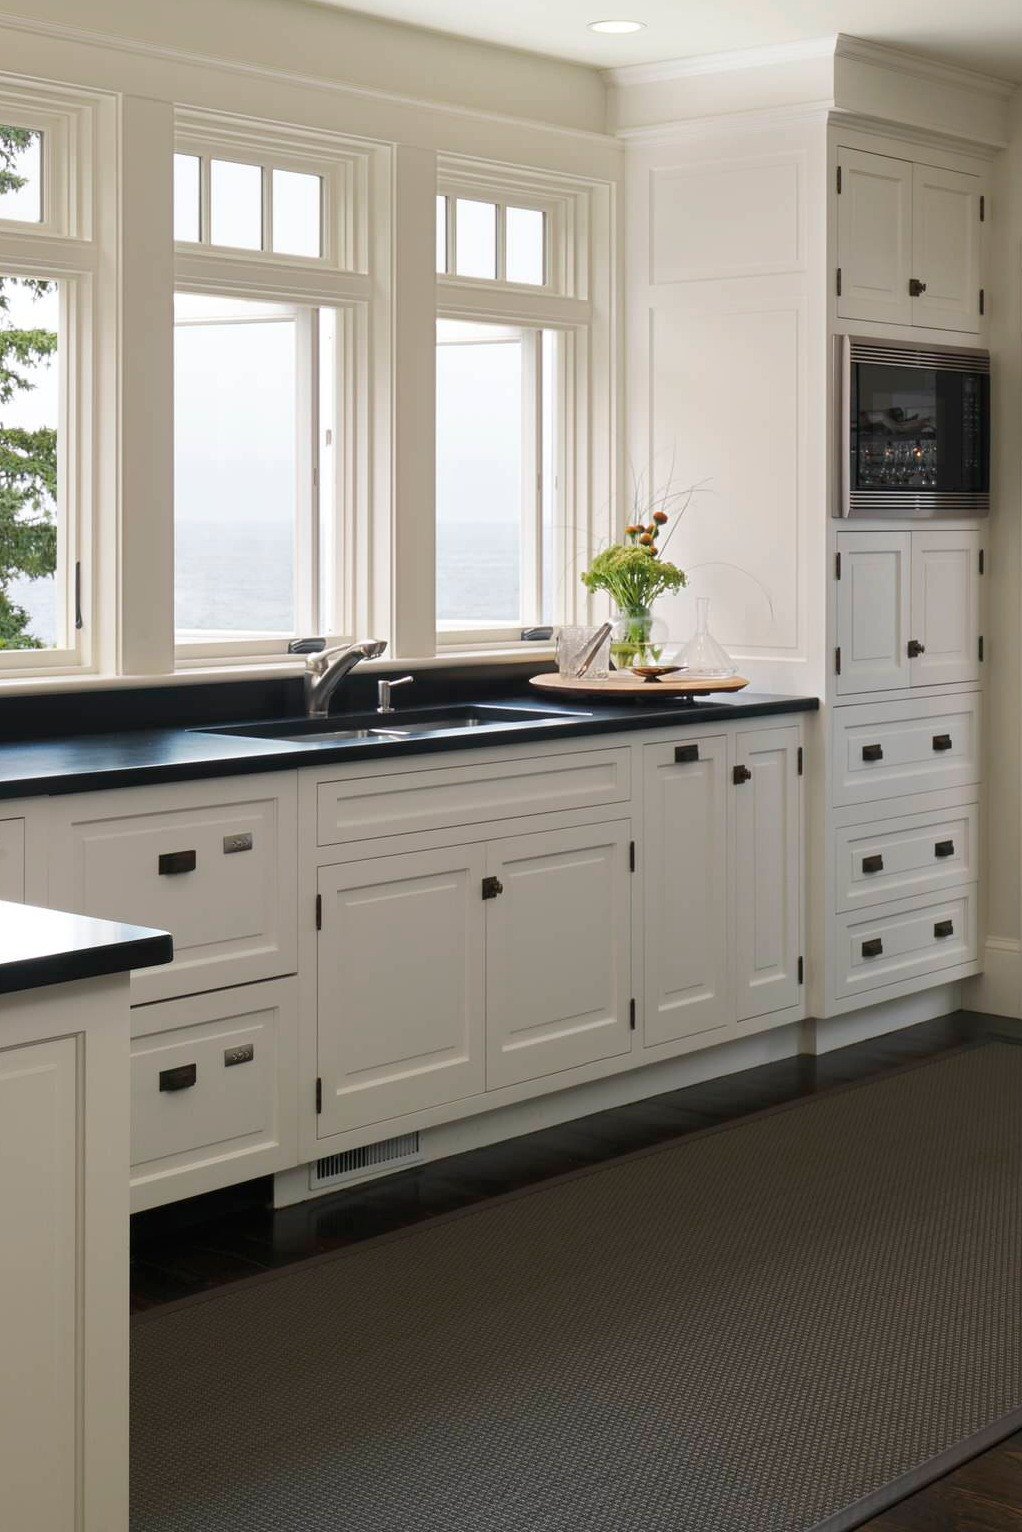 Black Granite Kitchen Countertops Design Ideas Countertopsnews